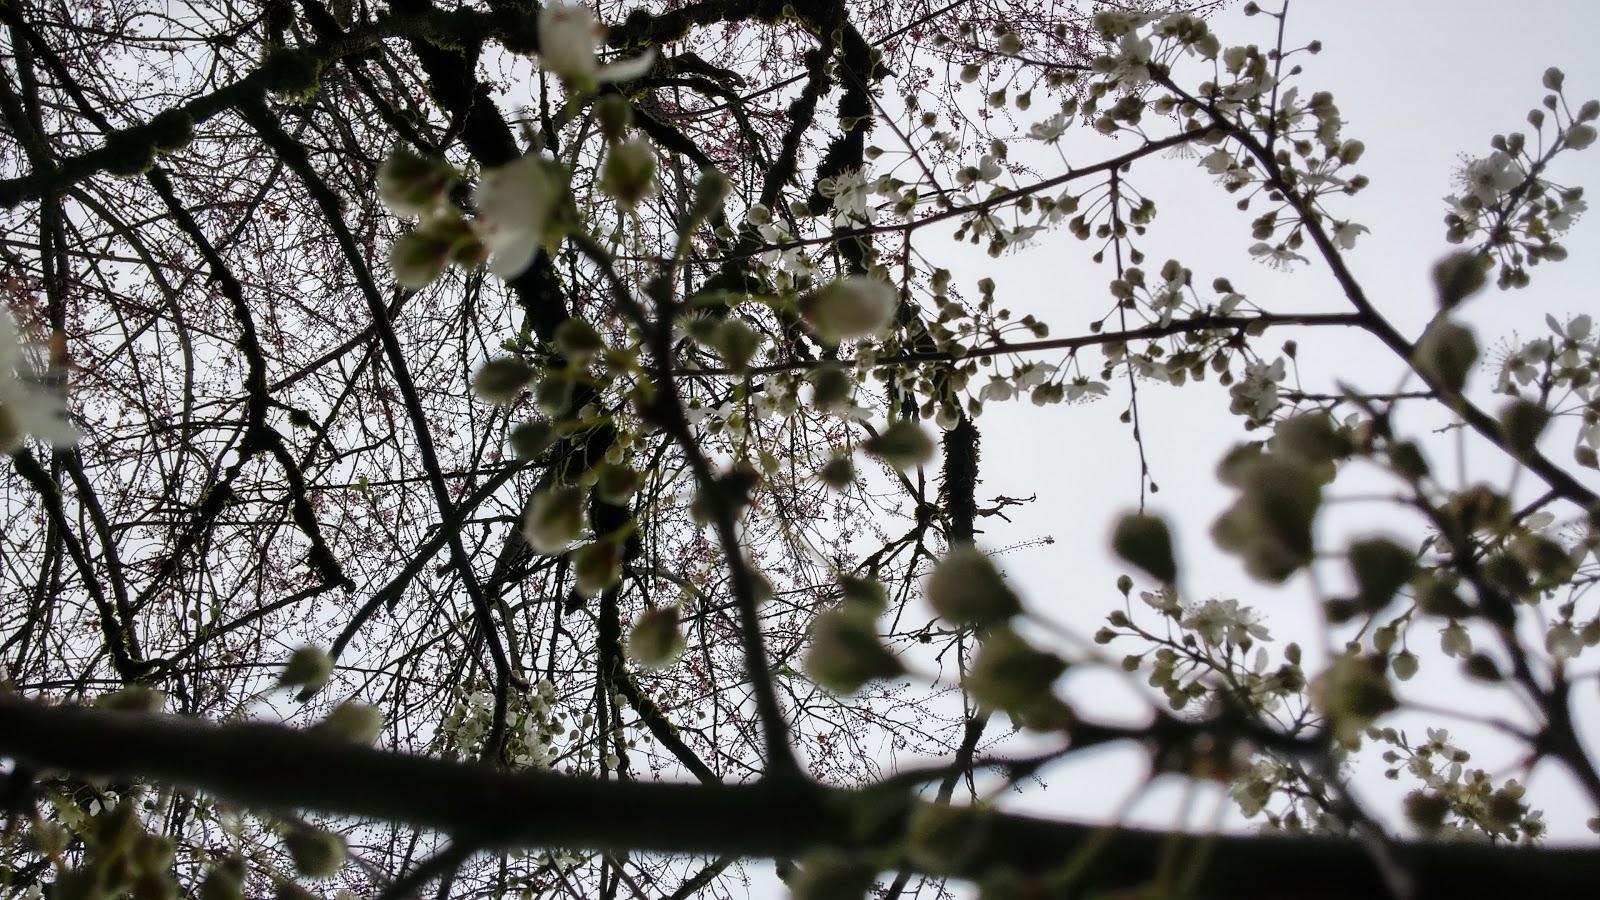 Spring, bringing its beauty